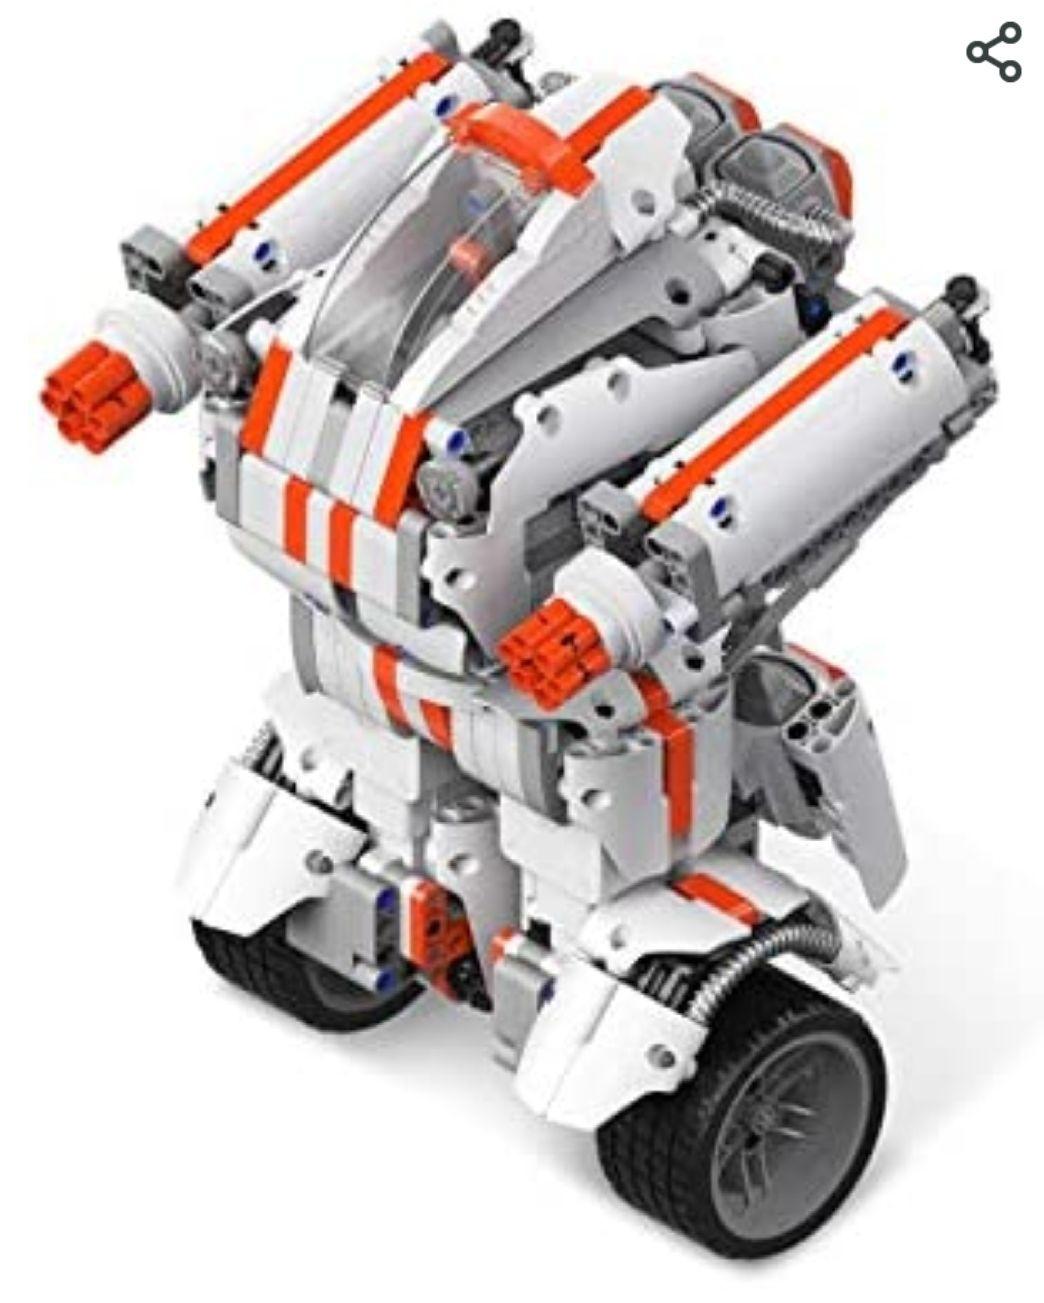 Xiaomi Mi Bunny Robot Builder - Juguete controlable por Smartphone